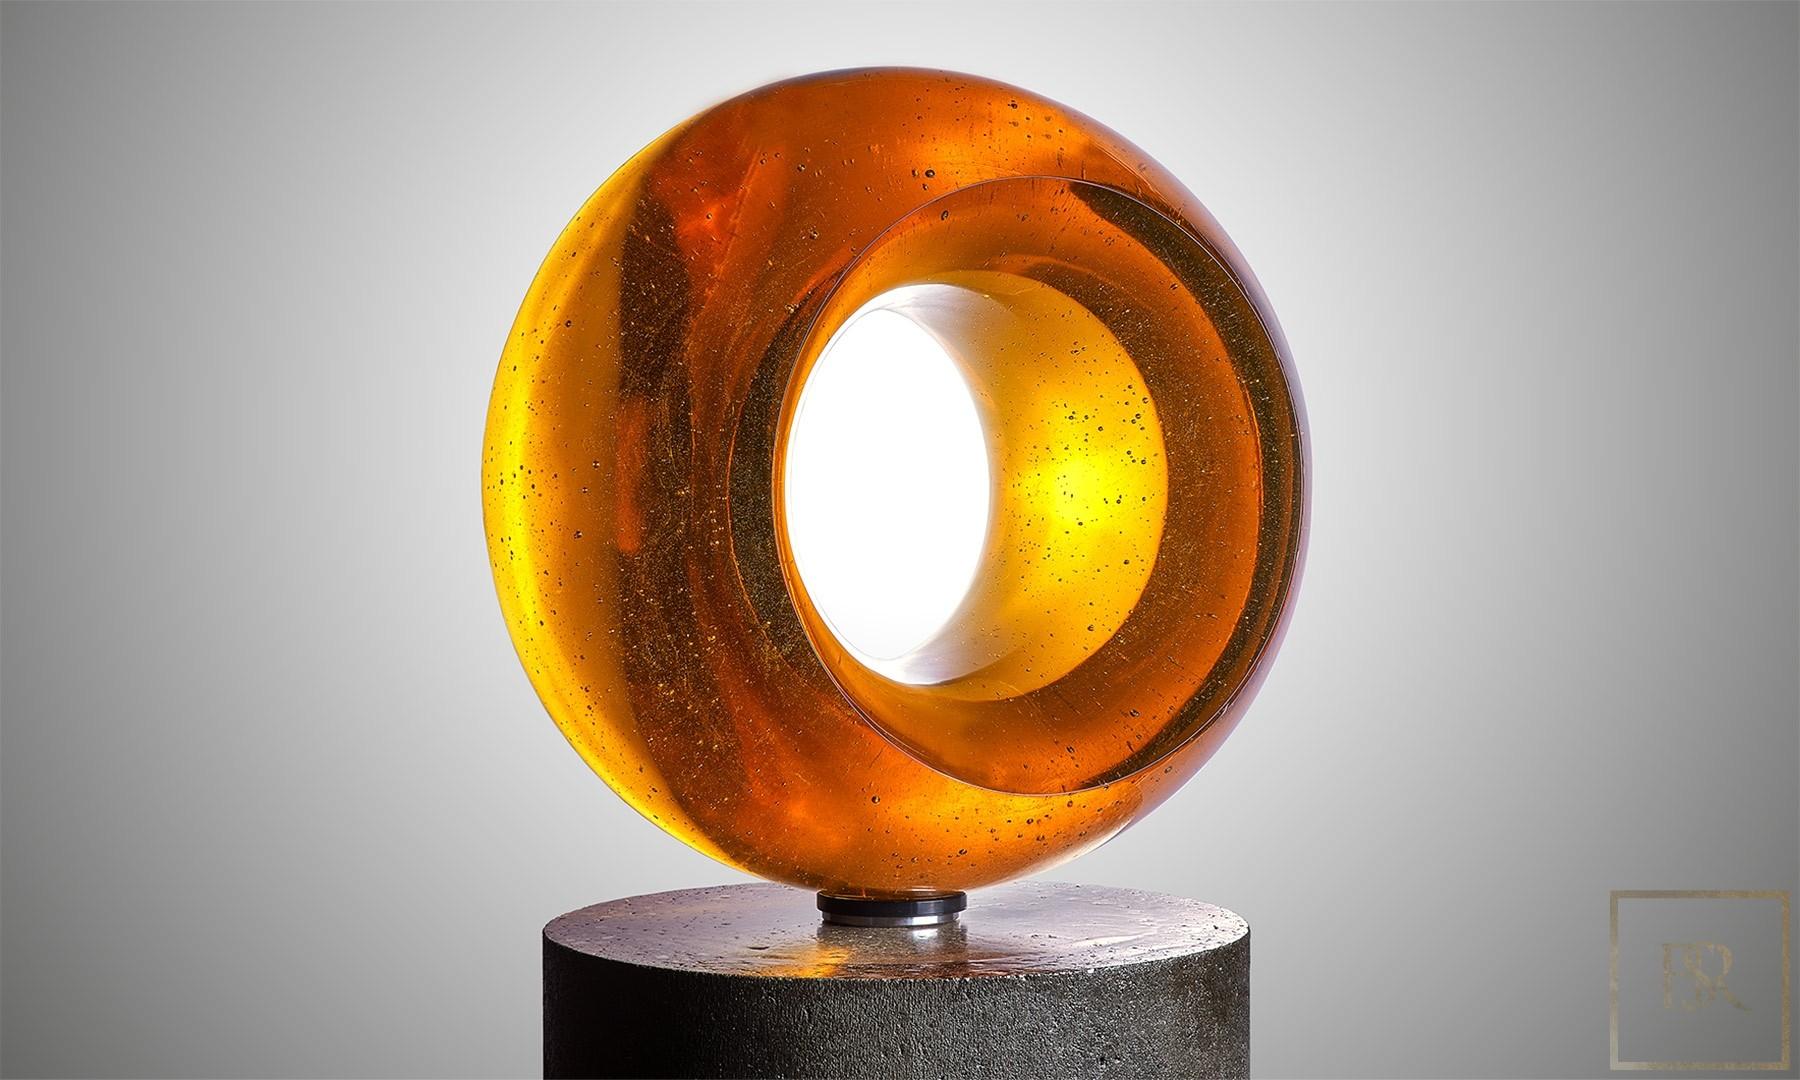 Art Sculpture EPICENTER Gold - Bohemian Crystal for sale For Super Rich